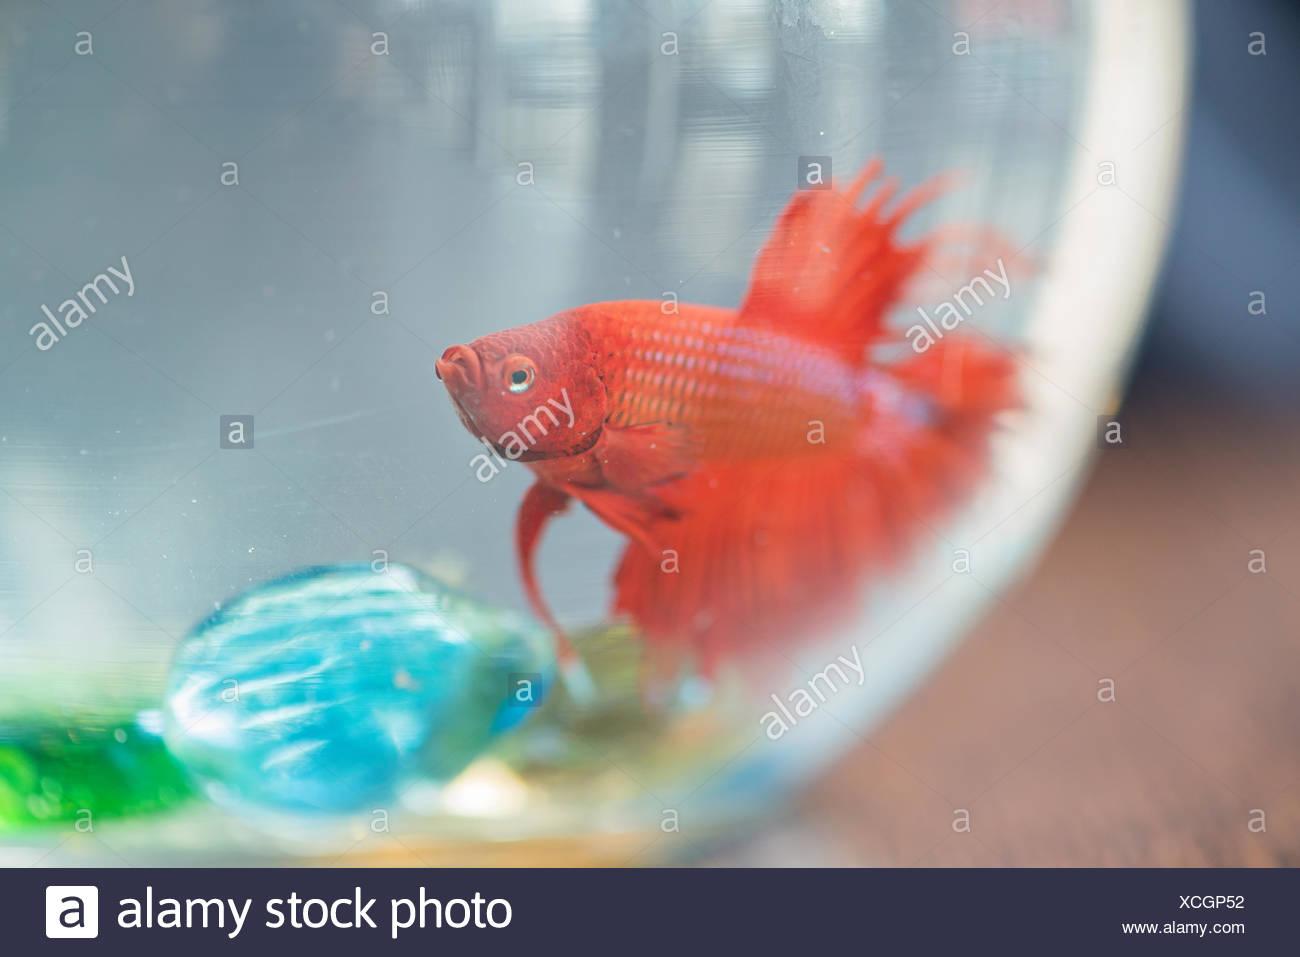 Small Fish Tank Stock Photos & Small Fish Tank Stock Images - Alamy